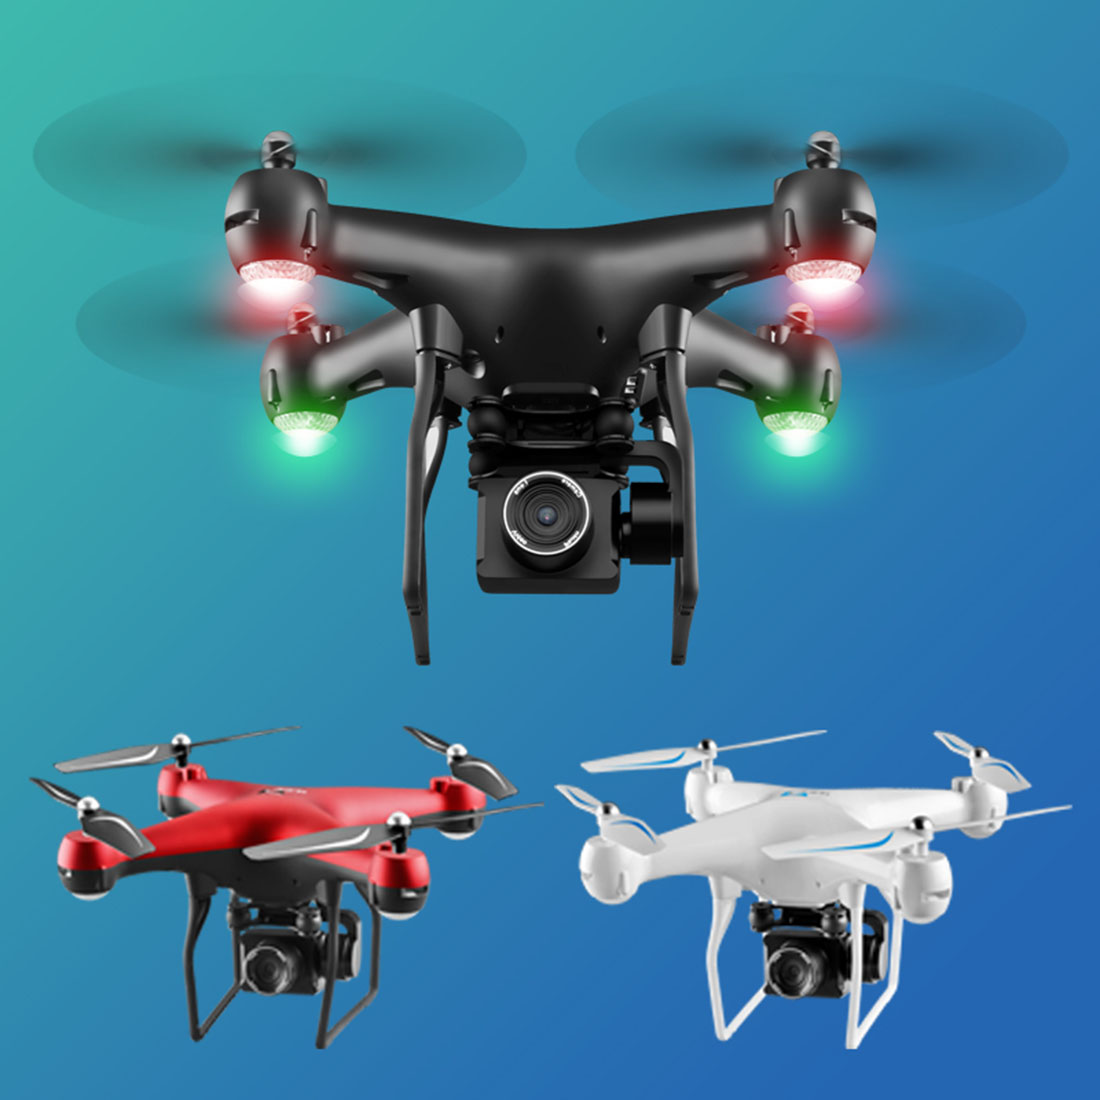 S32T 4K caméra rotative HD antenne Quadrangle Wifi FPV Drone RC hélicoptère caméra hélicoptère caméra quadrirotor vol 20 minutes